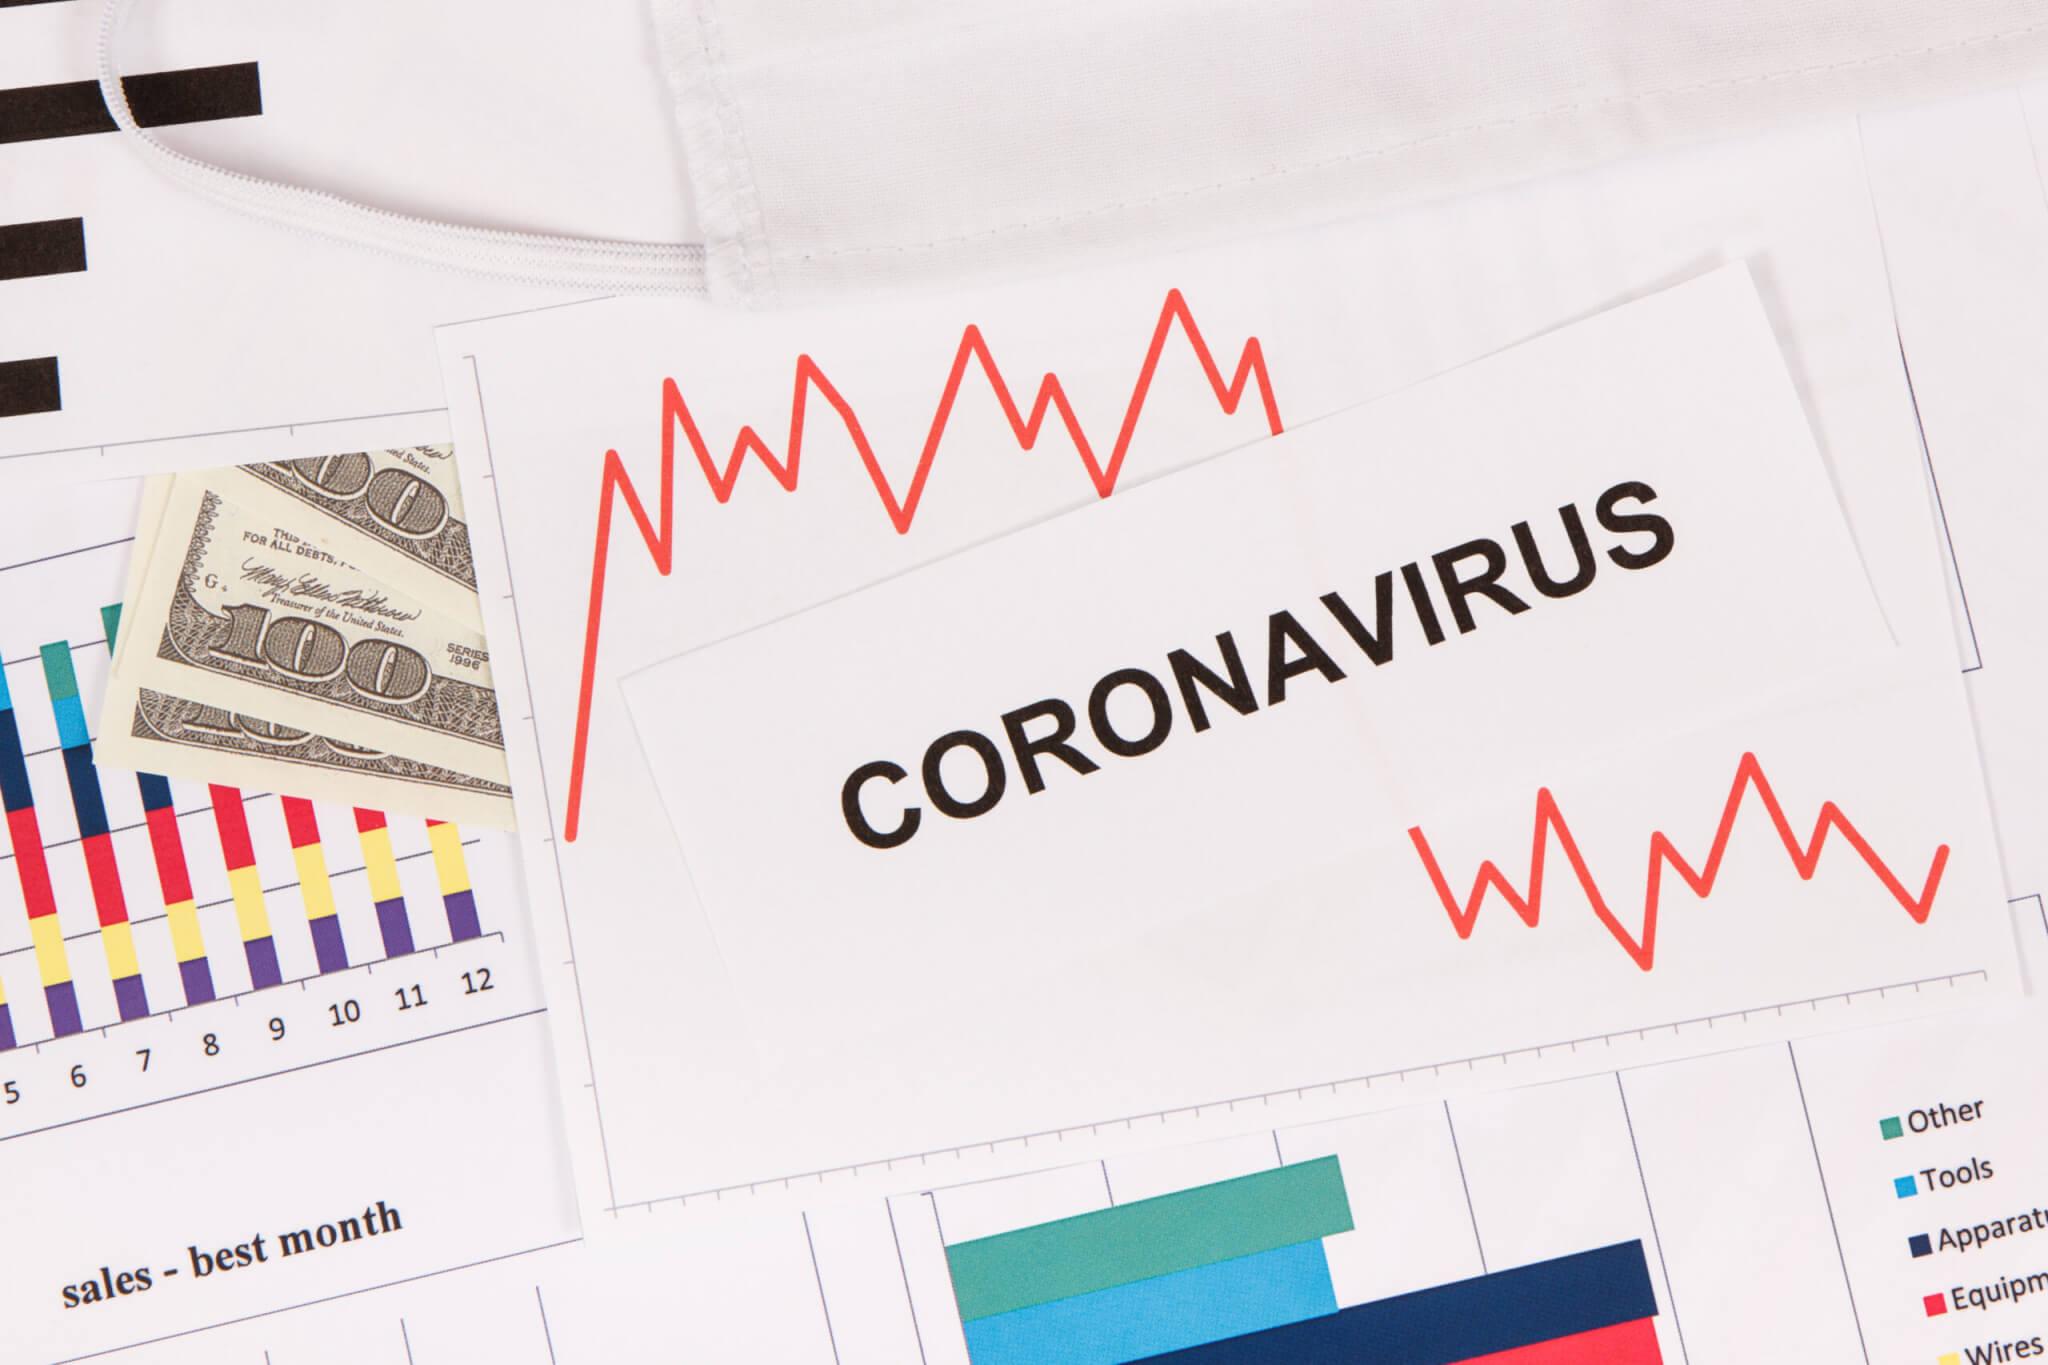 beleggen zonder risico corona